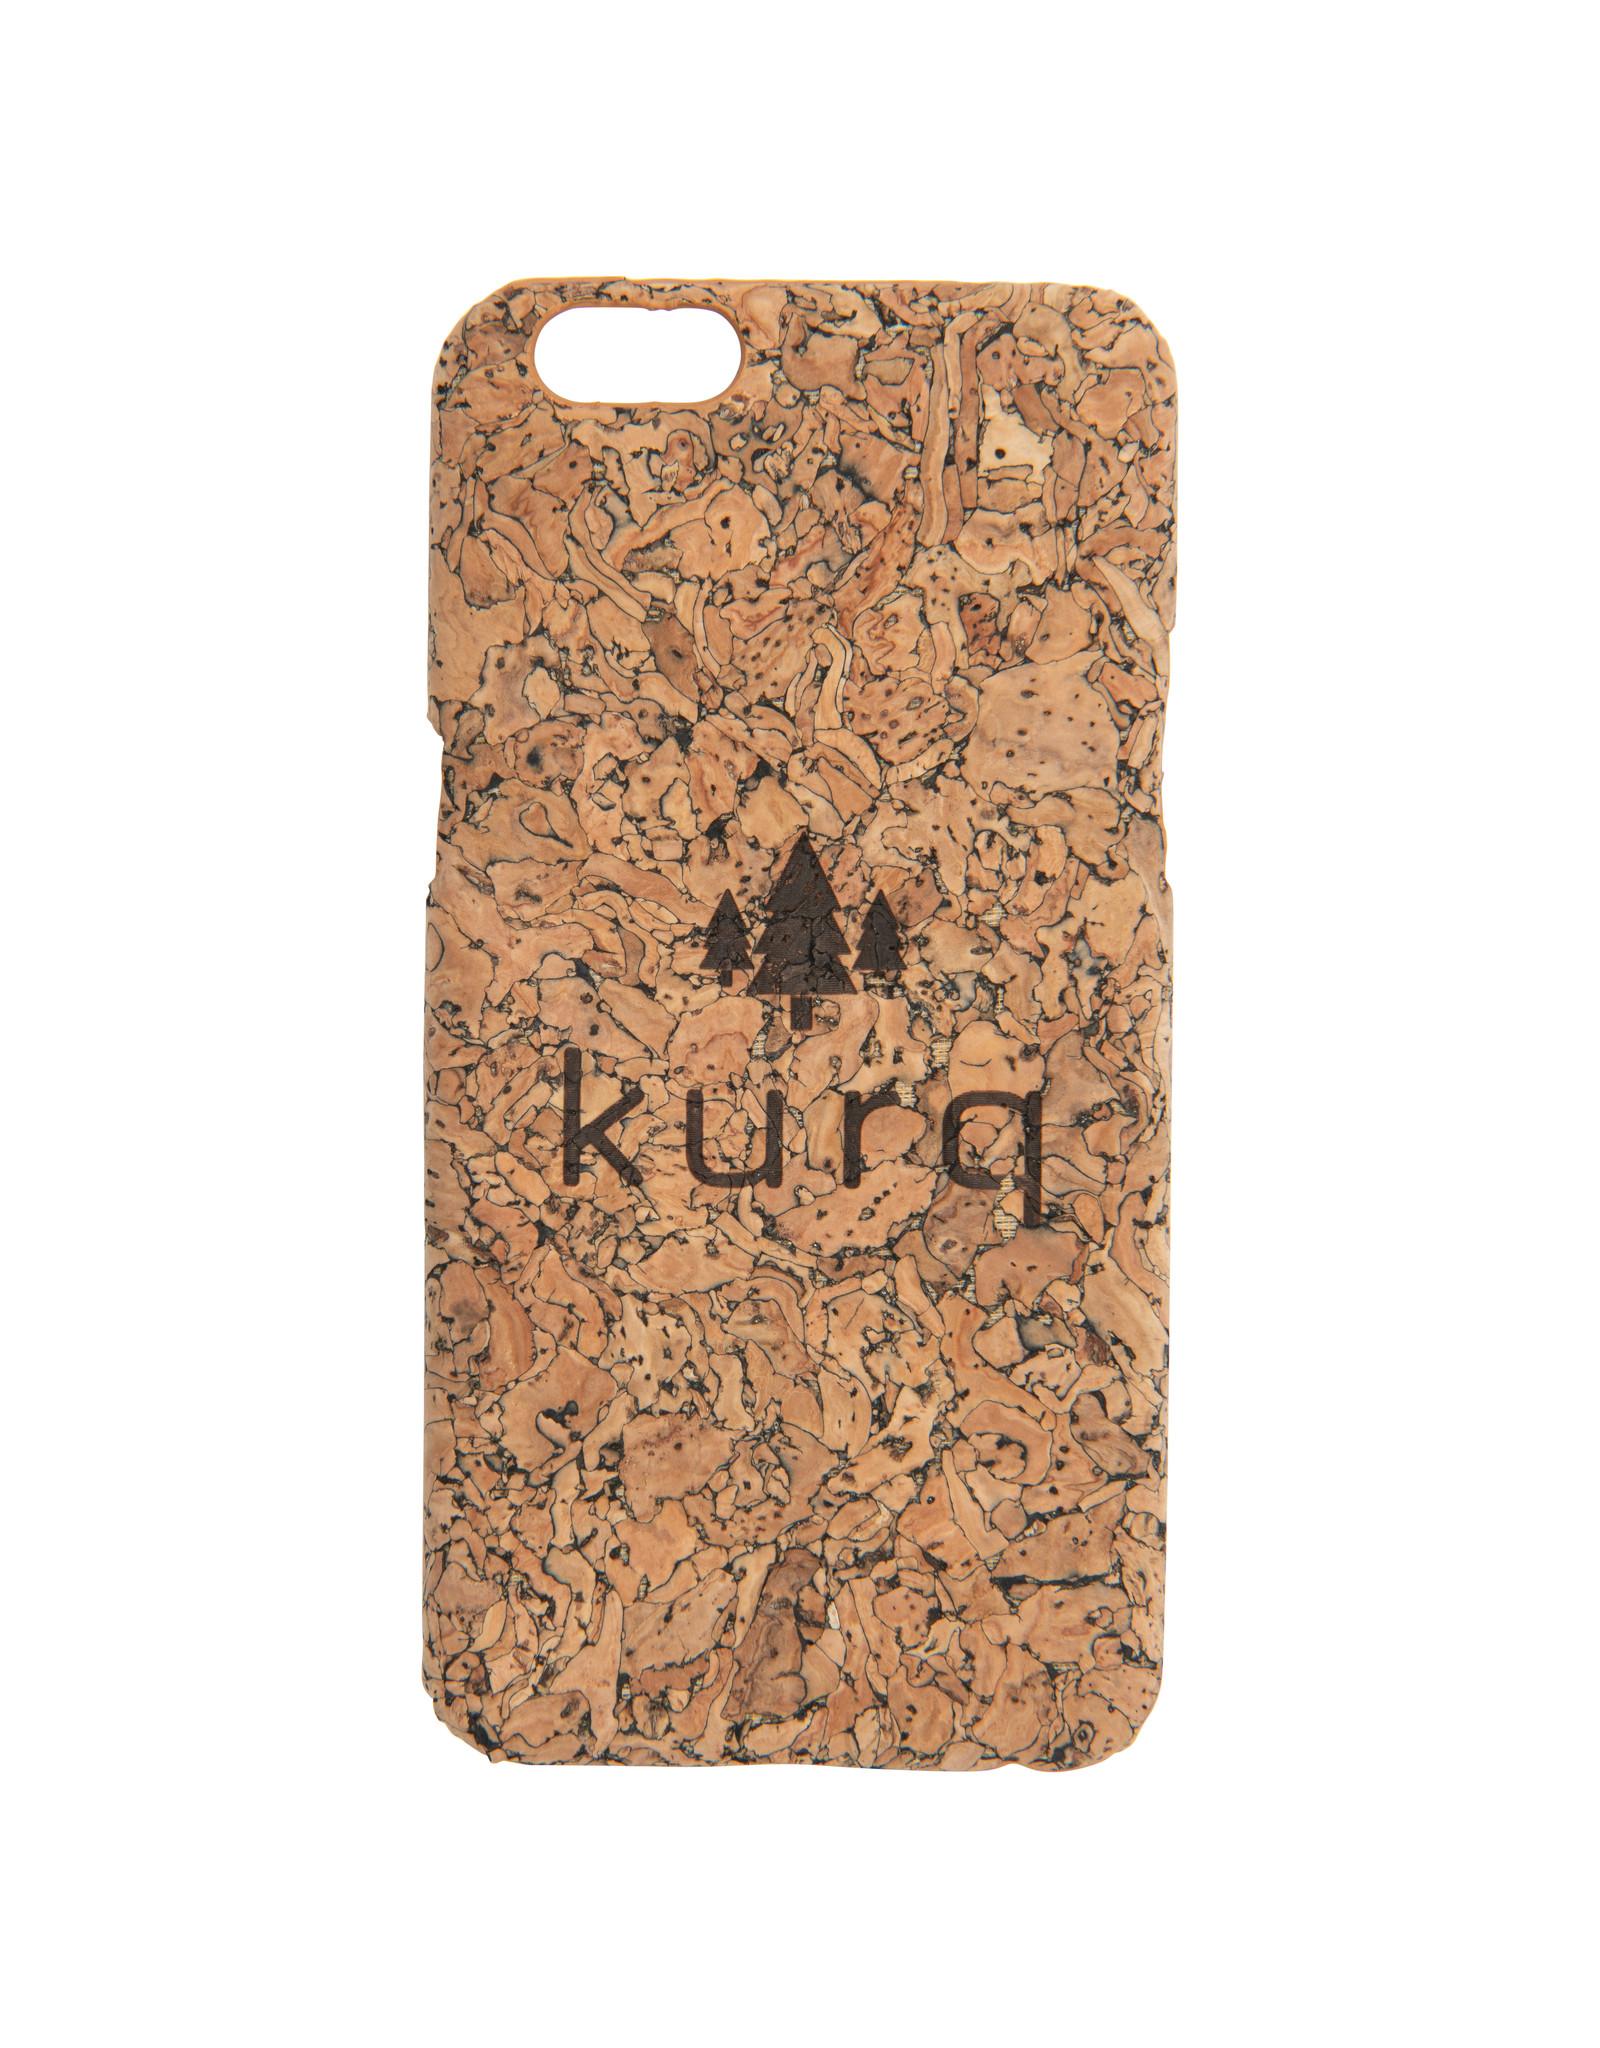 KURQ - Cork phone case for Oppo A39